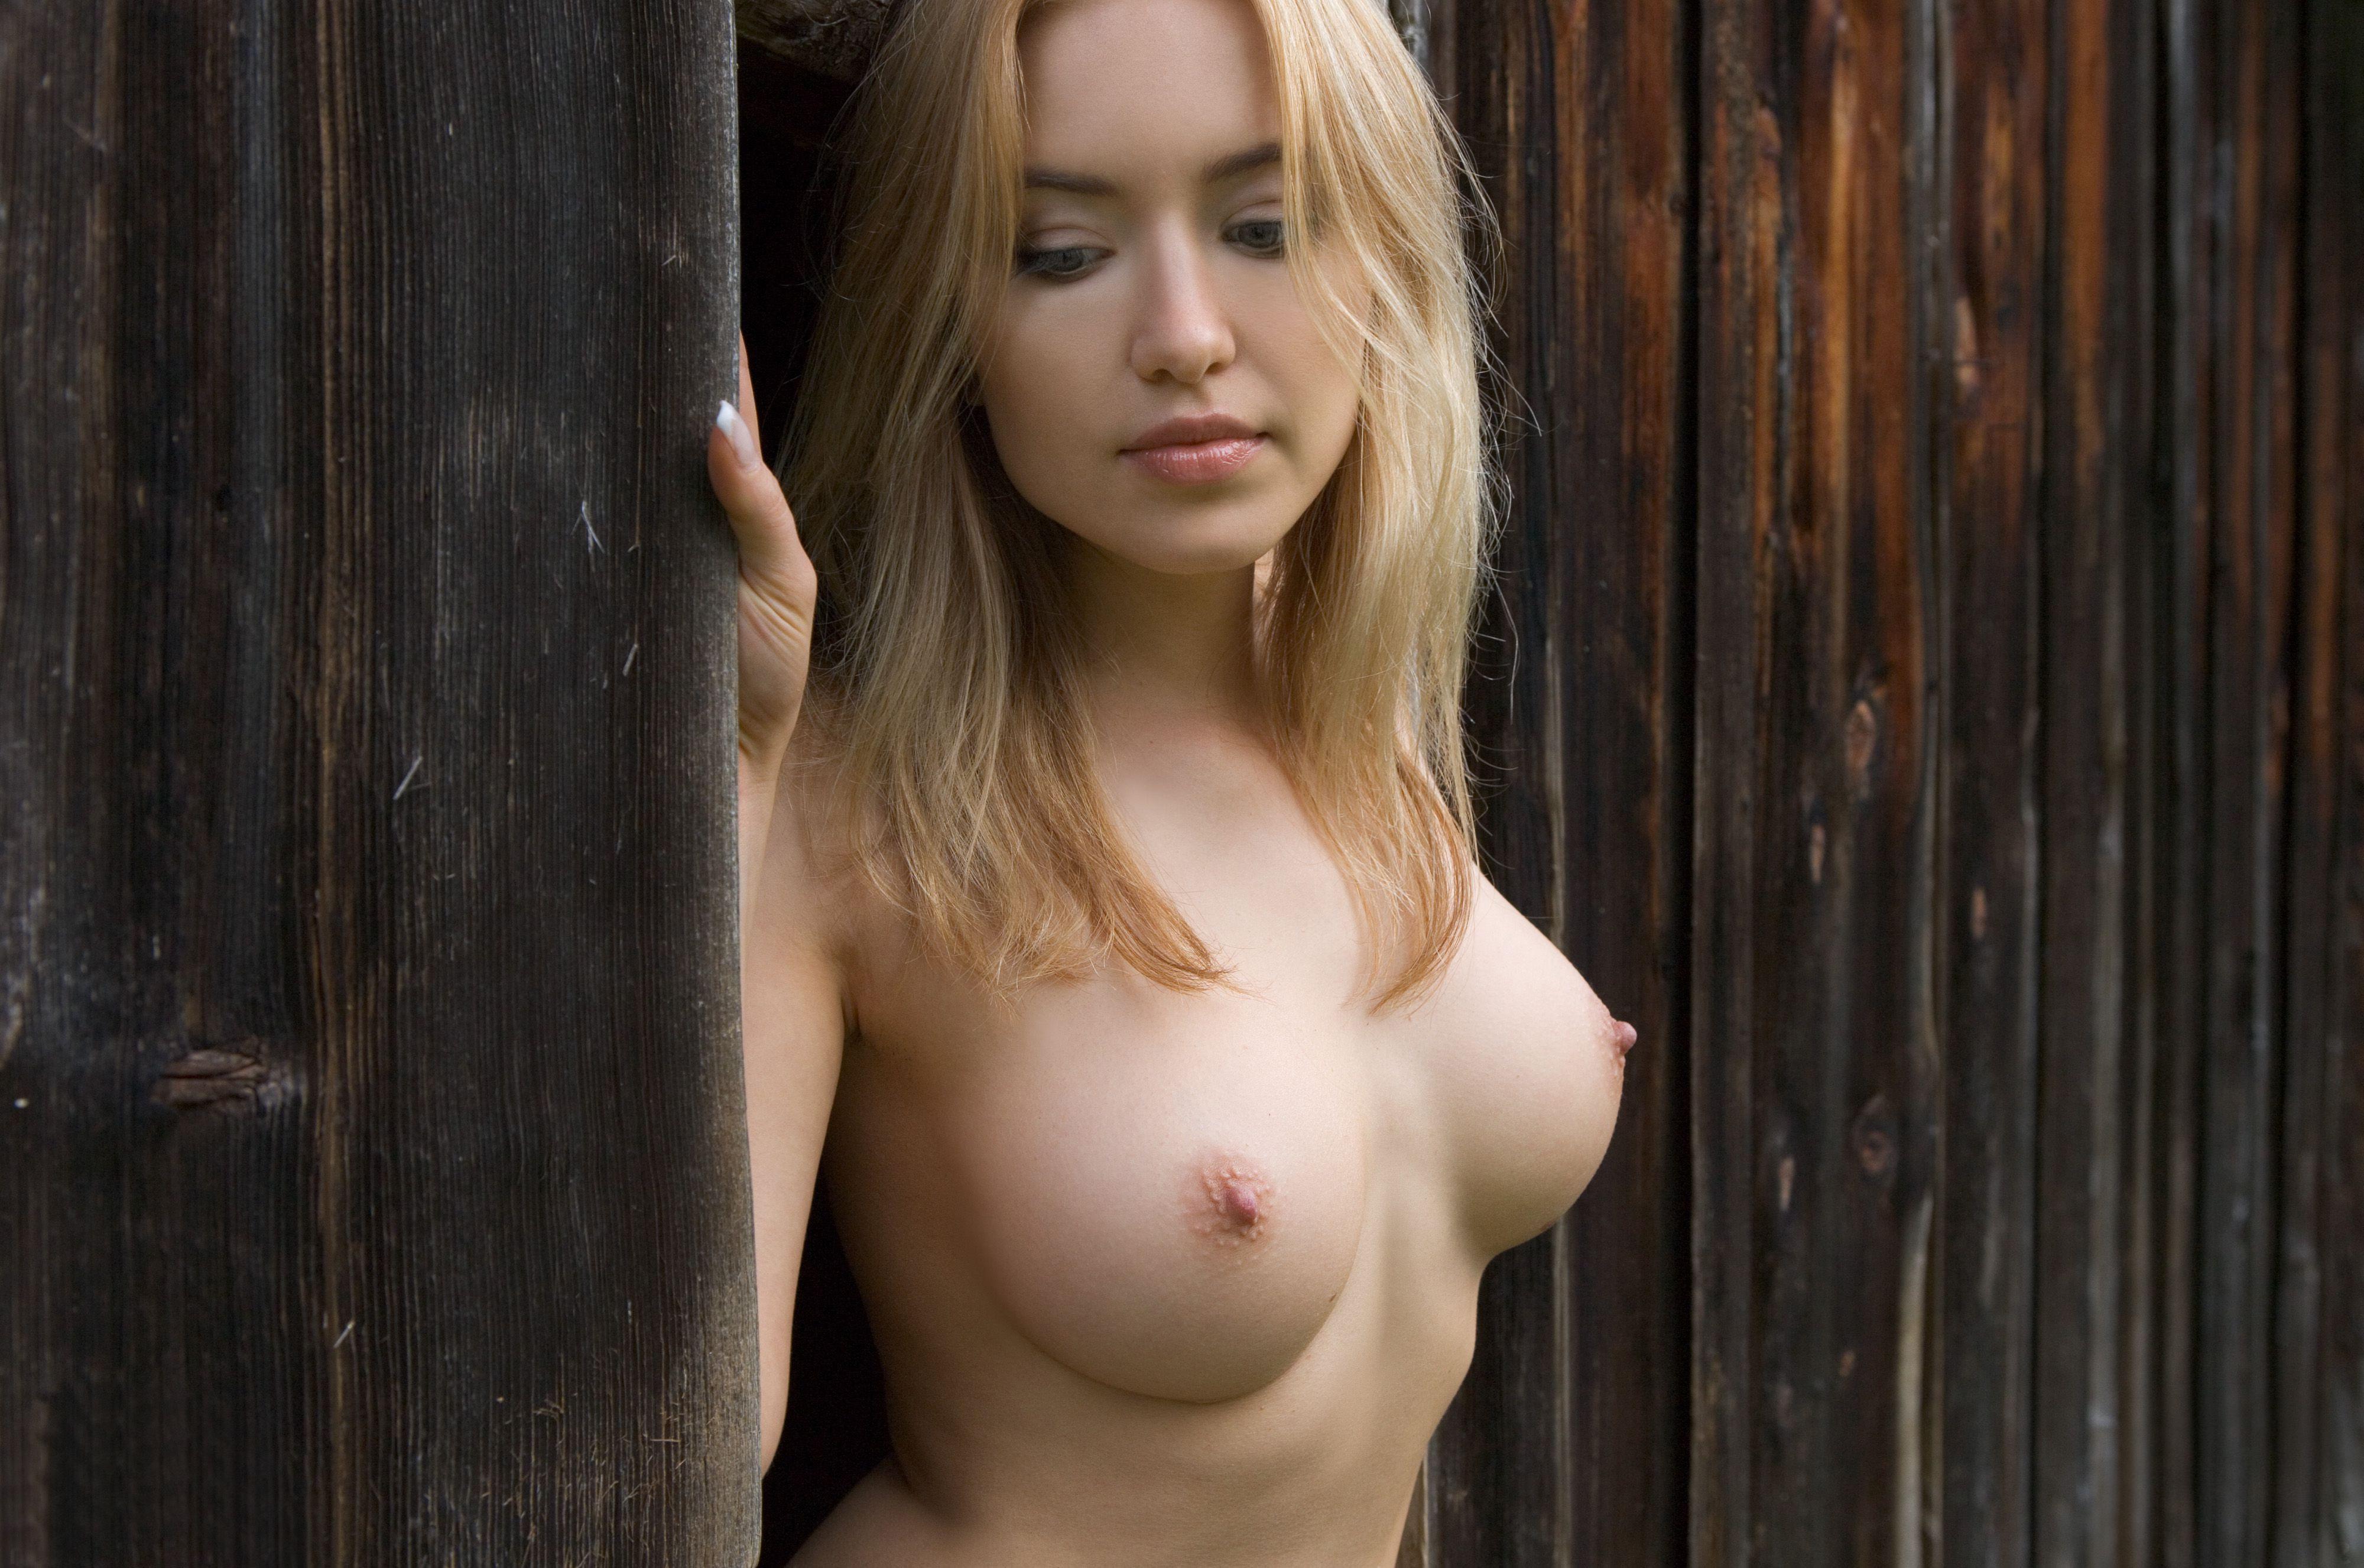 nude-blonde-girls-boobs-mix-vol7-71